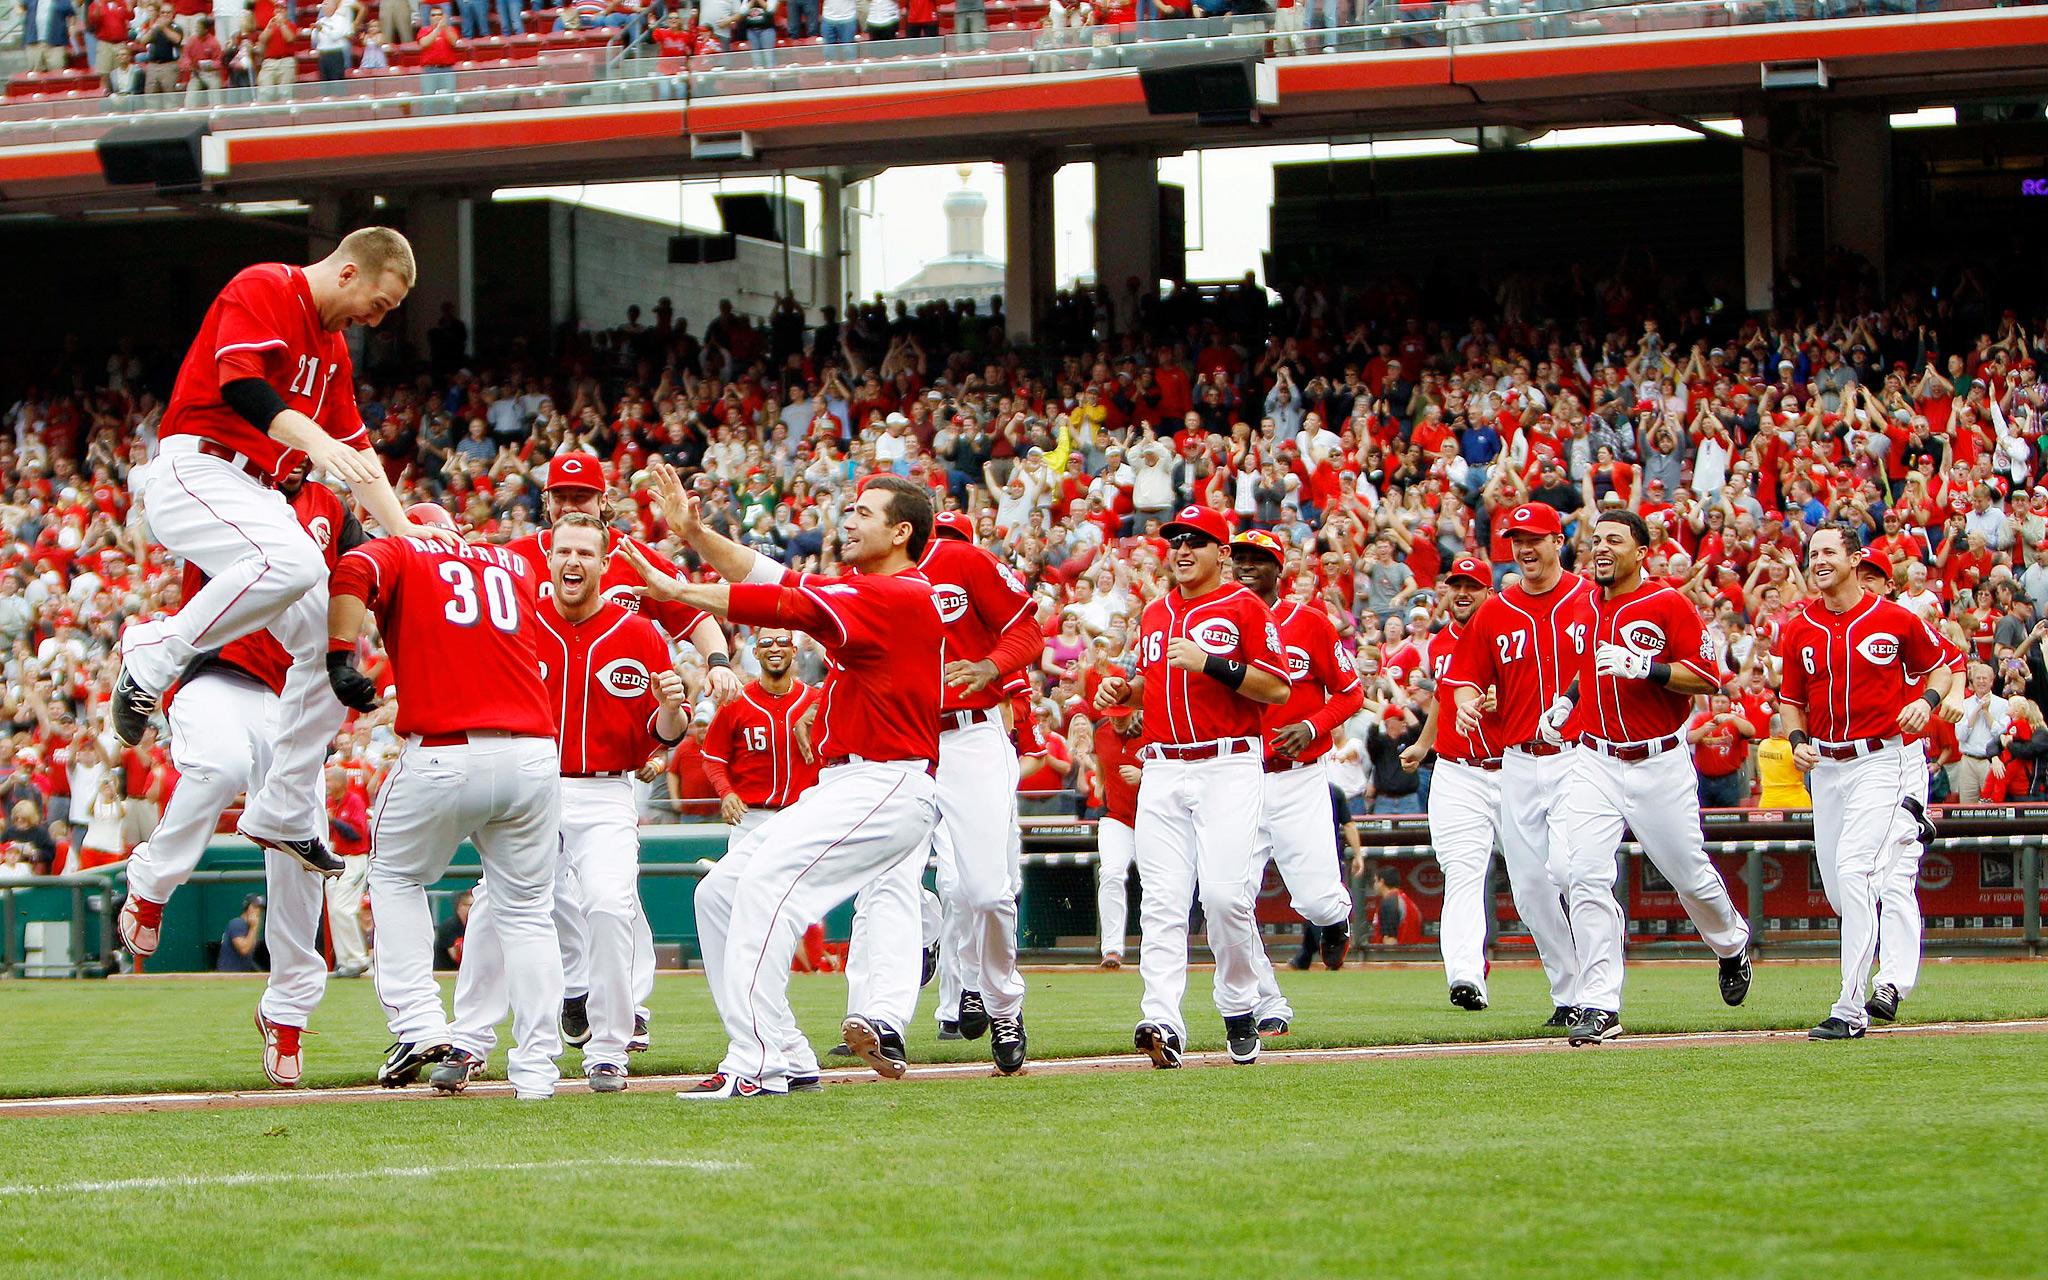 CINCINNATI REDS Mlb Baseball 26 Wallpaper